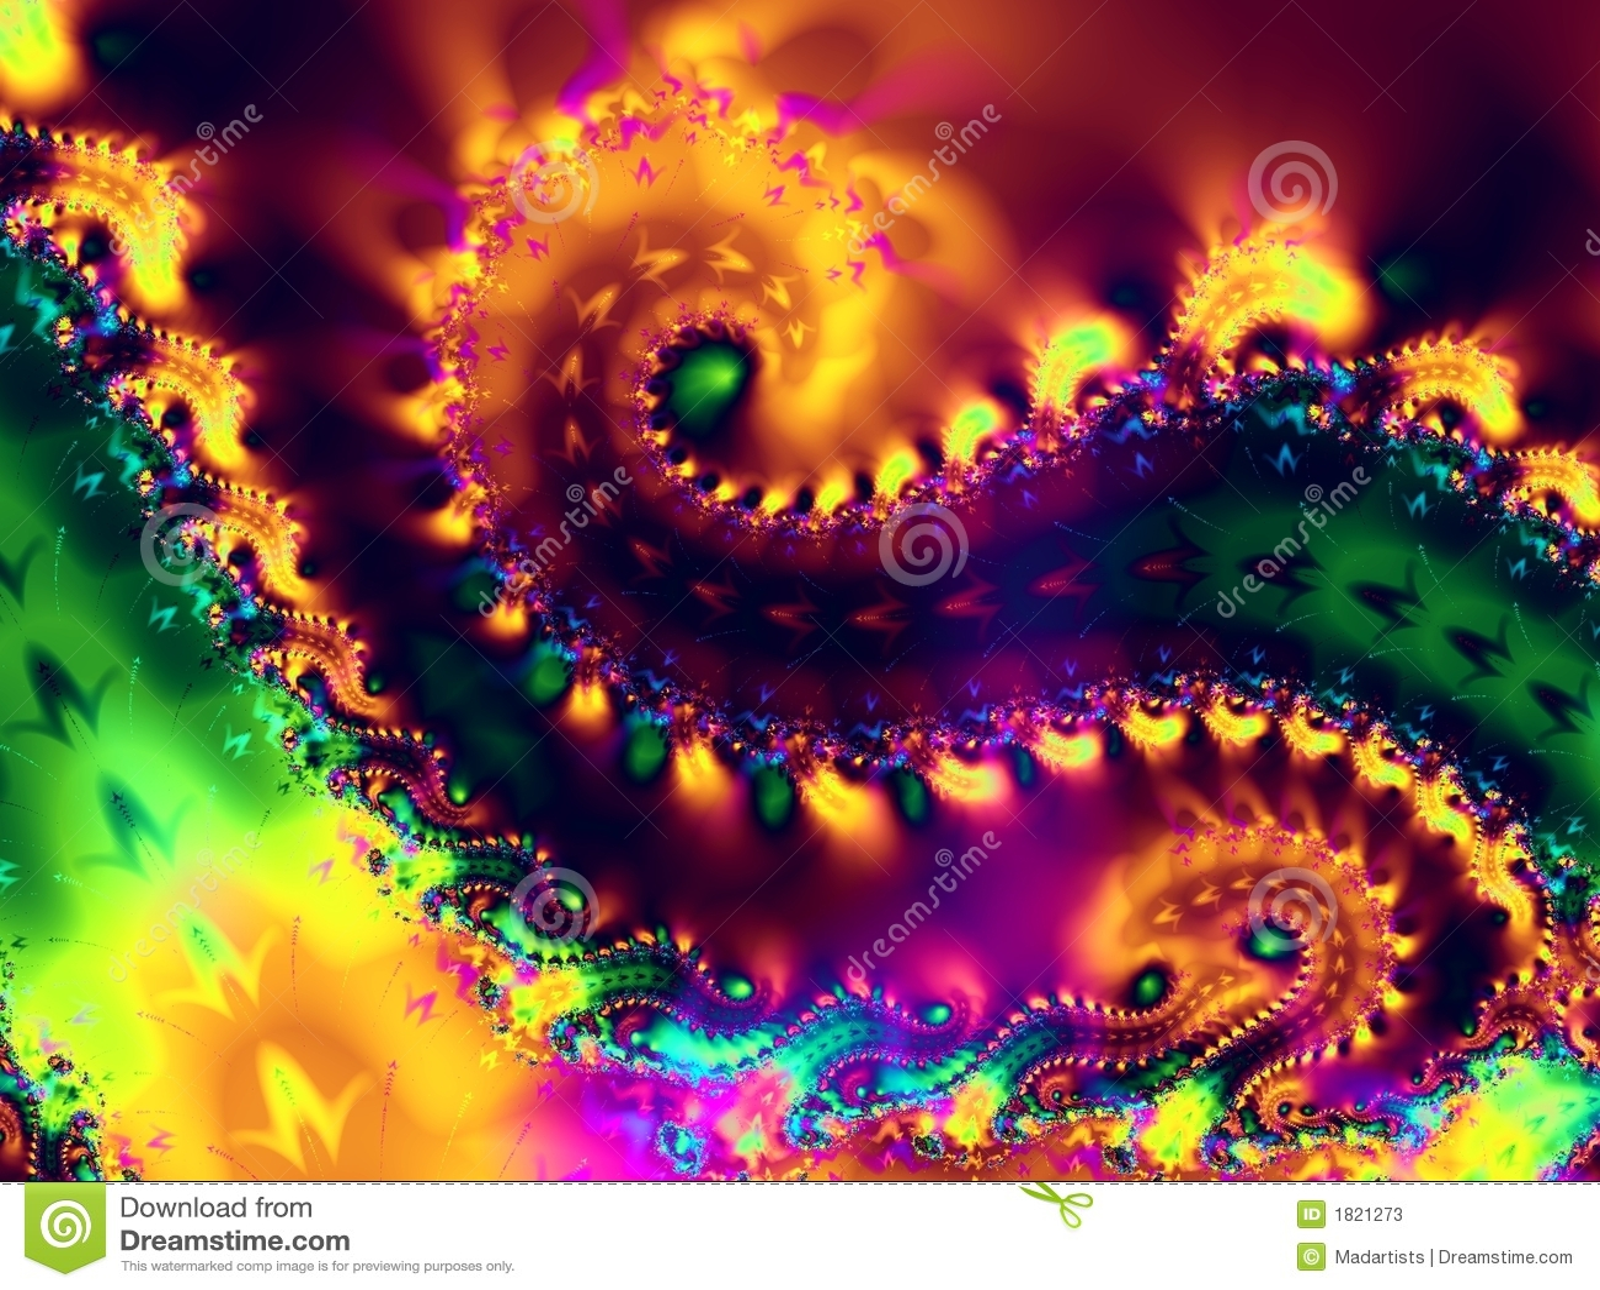 Spiral Swirls Fractal Texture Stock Photos Image 1821273